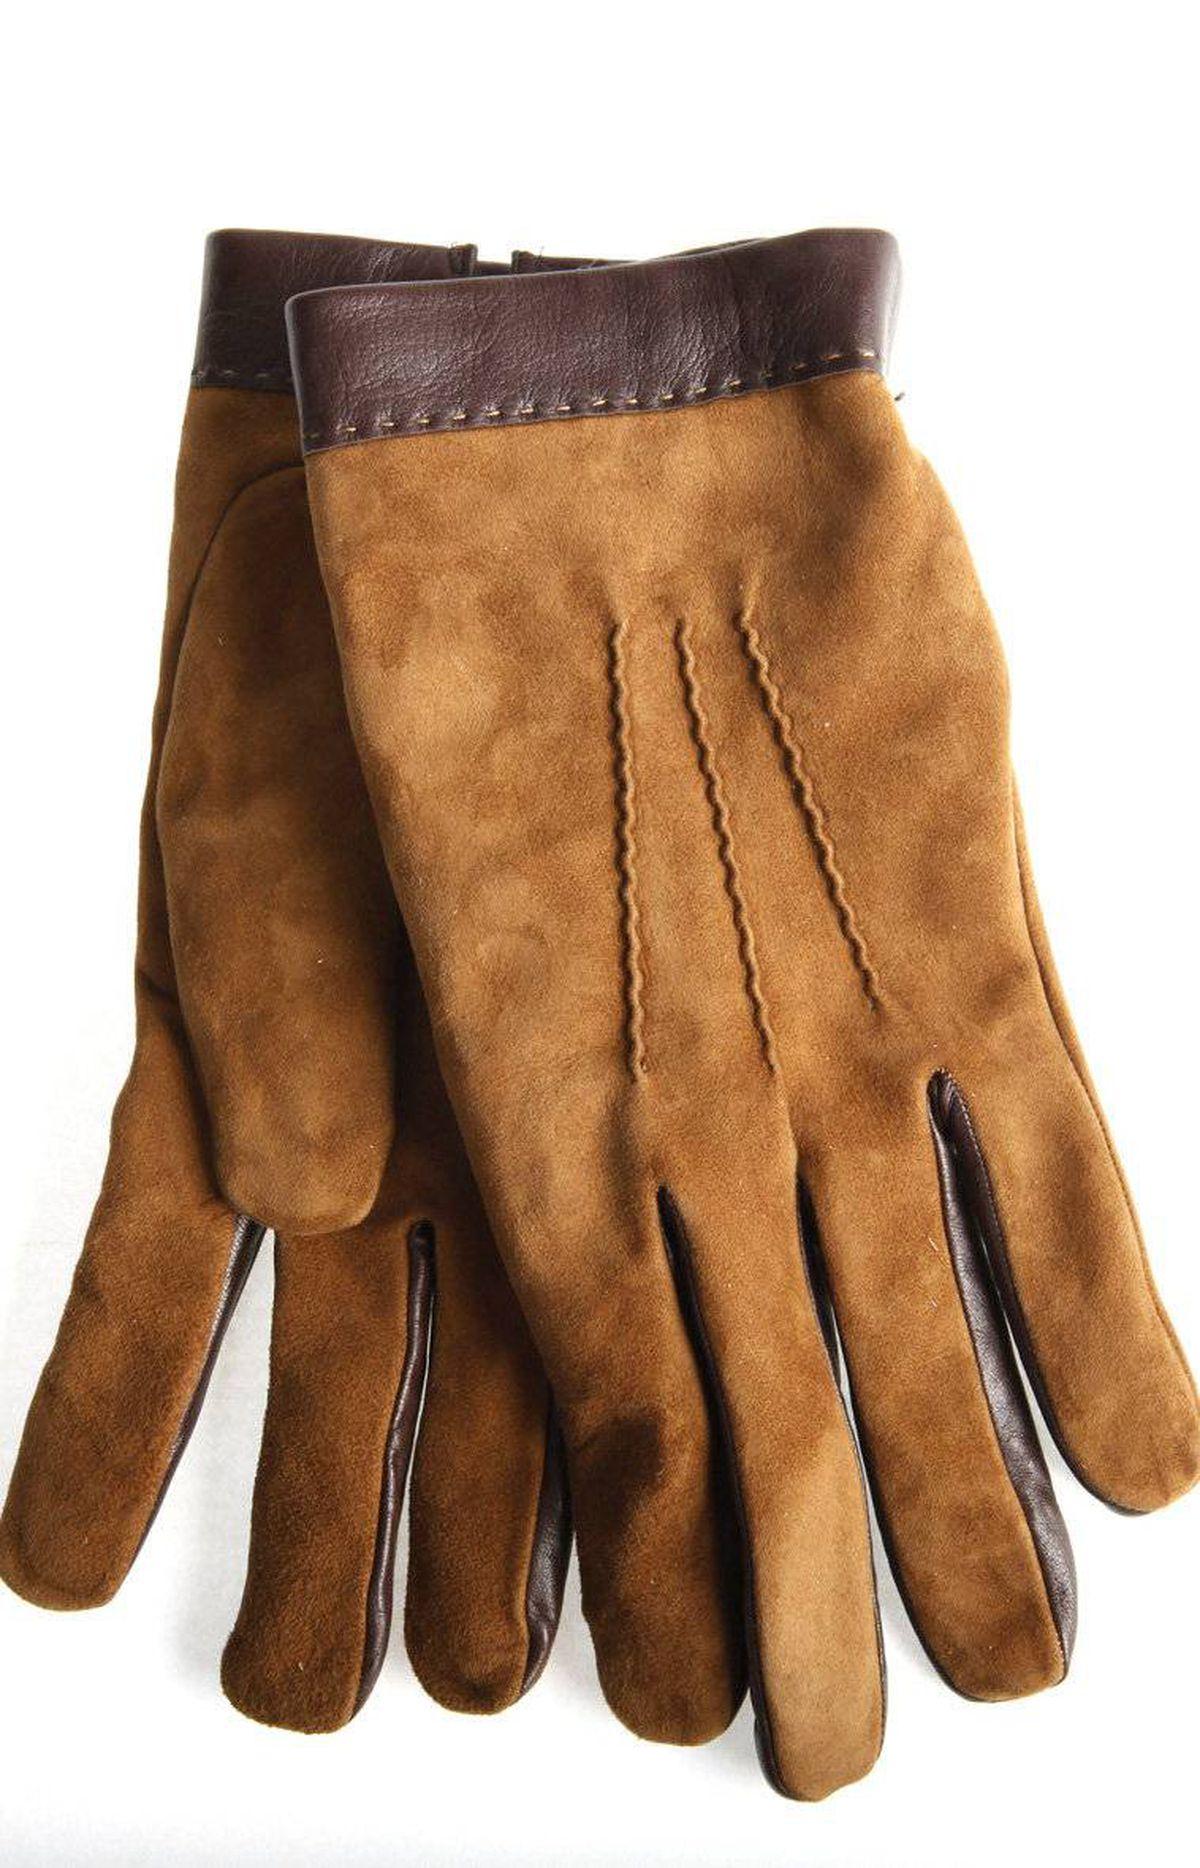 Camel gloves, $85 at Banana Republic (www.bananarepublic.com).